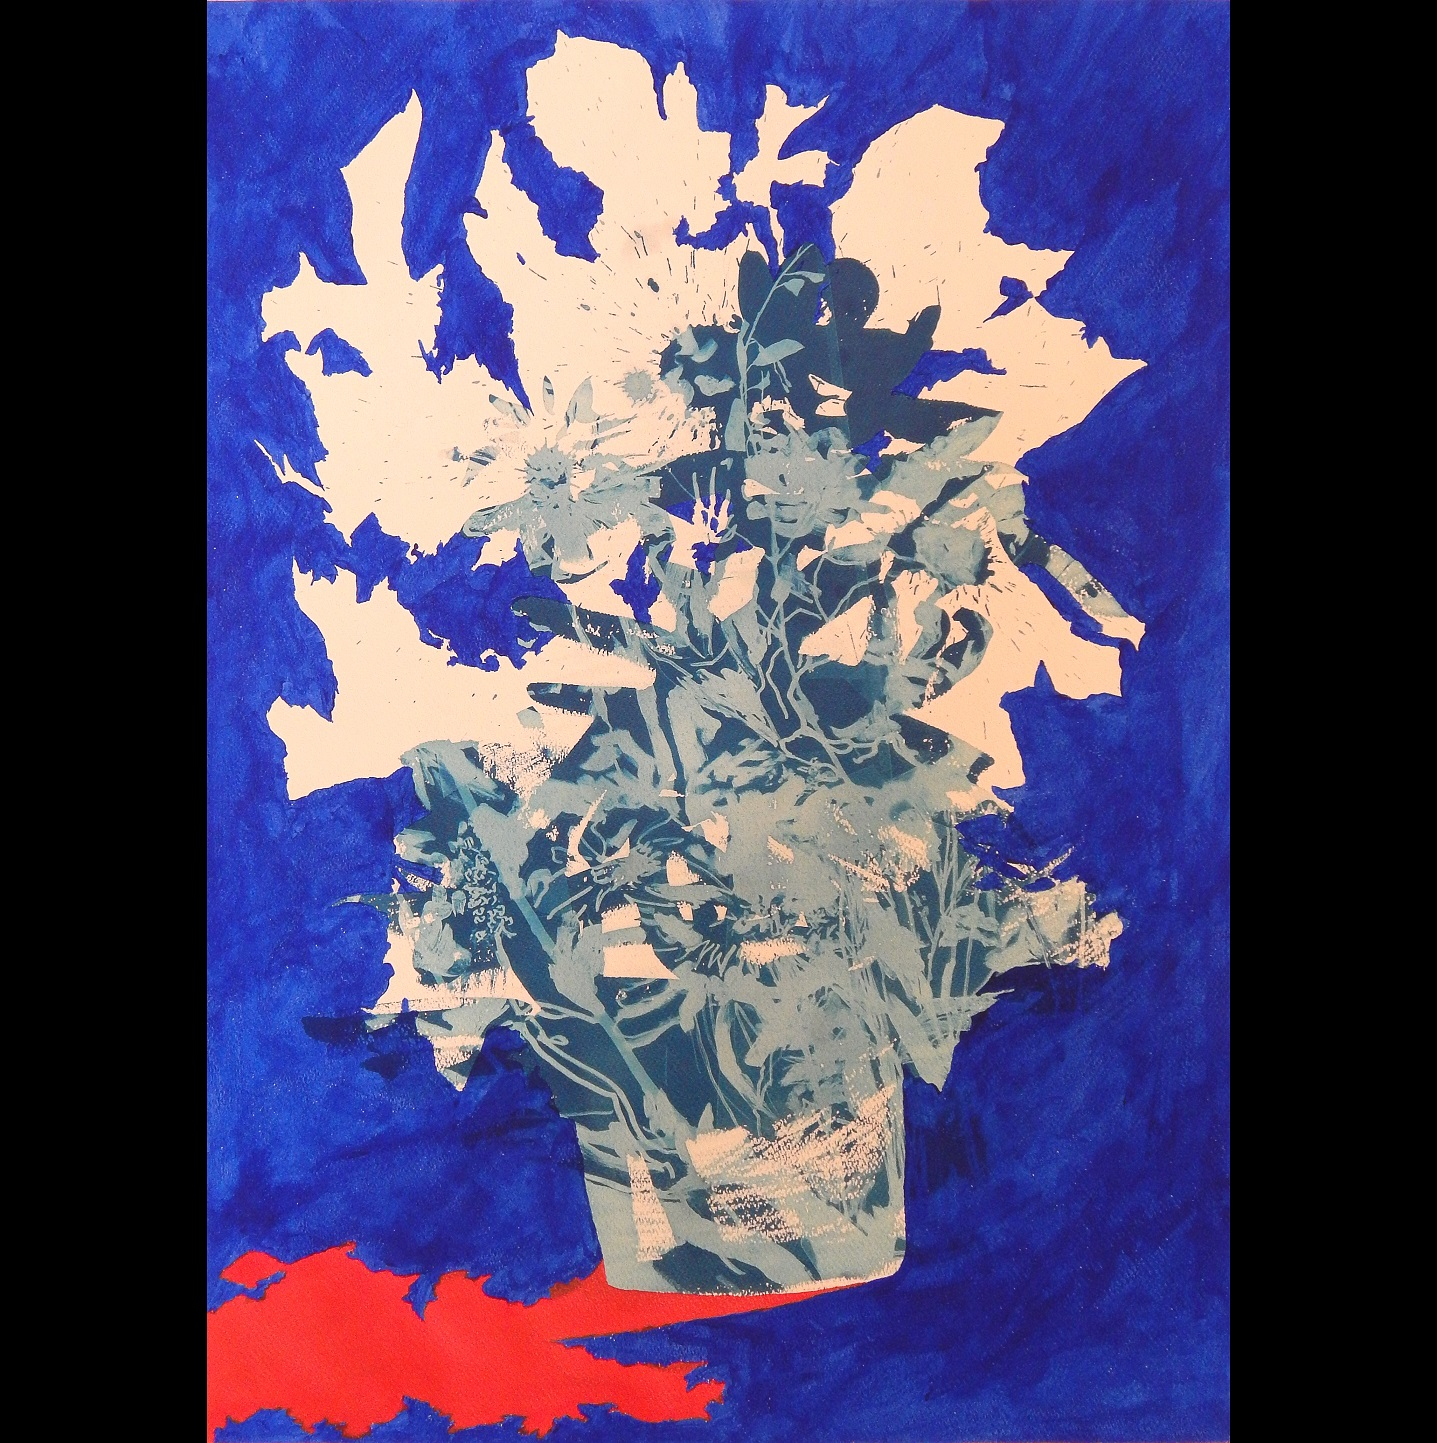 Still Life #3, 2012, acrylic & cyanotype